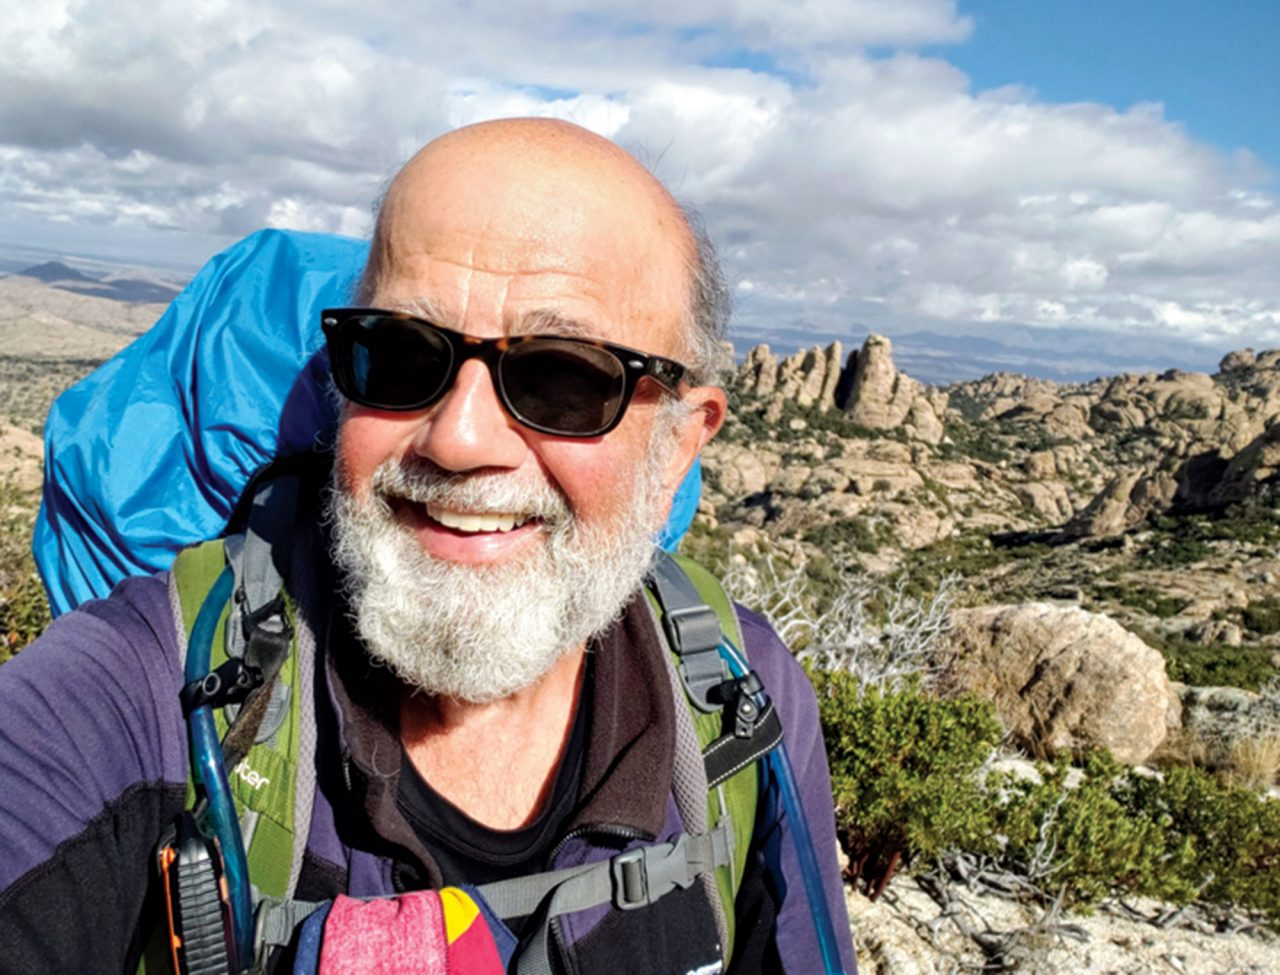 on the Arizona Trail in the Rincon Mountains south of Tucson